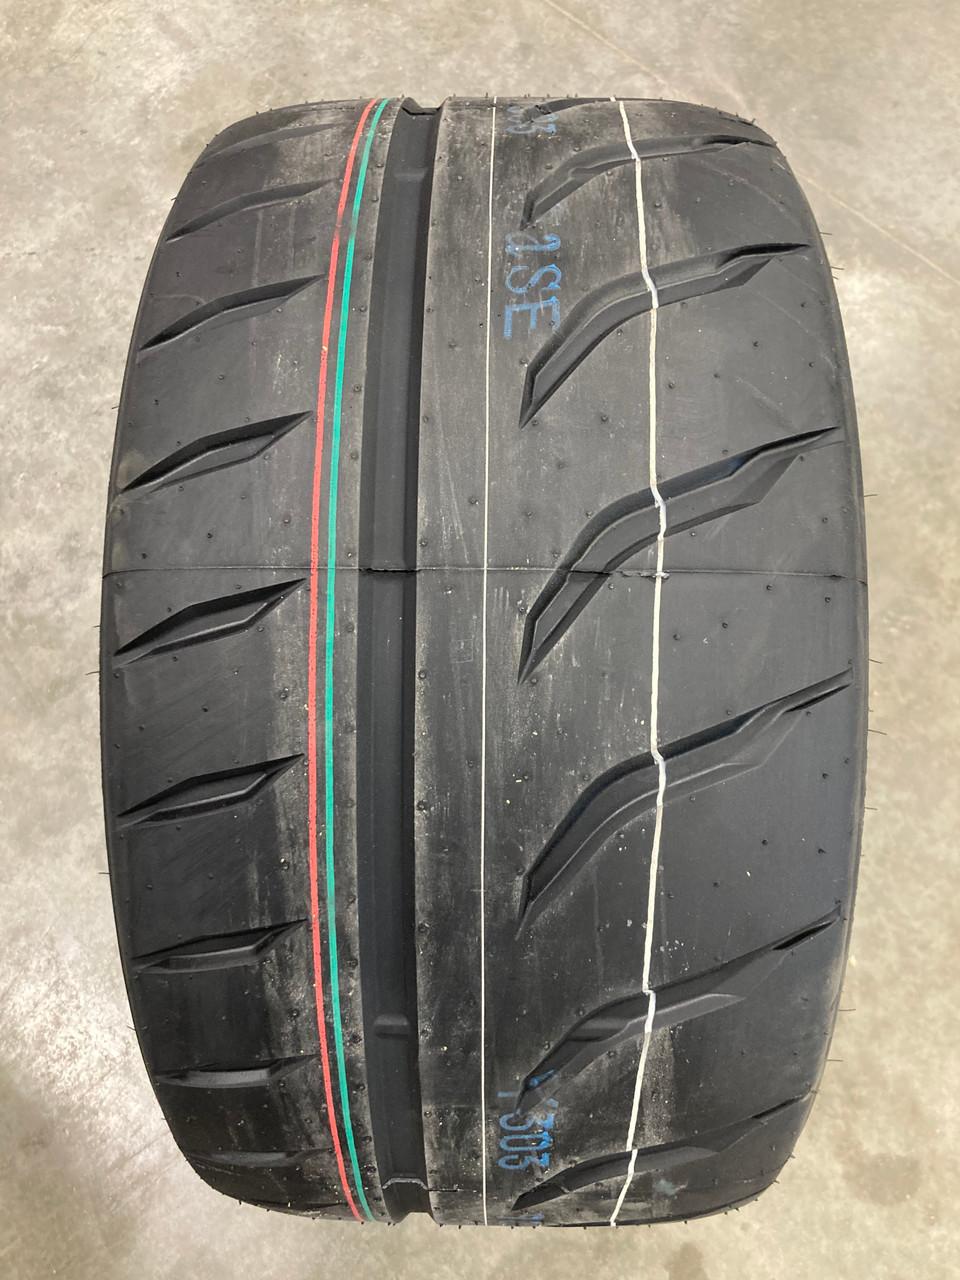 New Tire 335 30 18 Toyo Proxes R888R BSW 102Y 335/30ZR18 Street RR